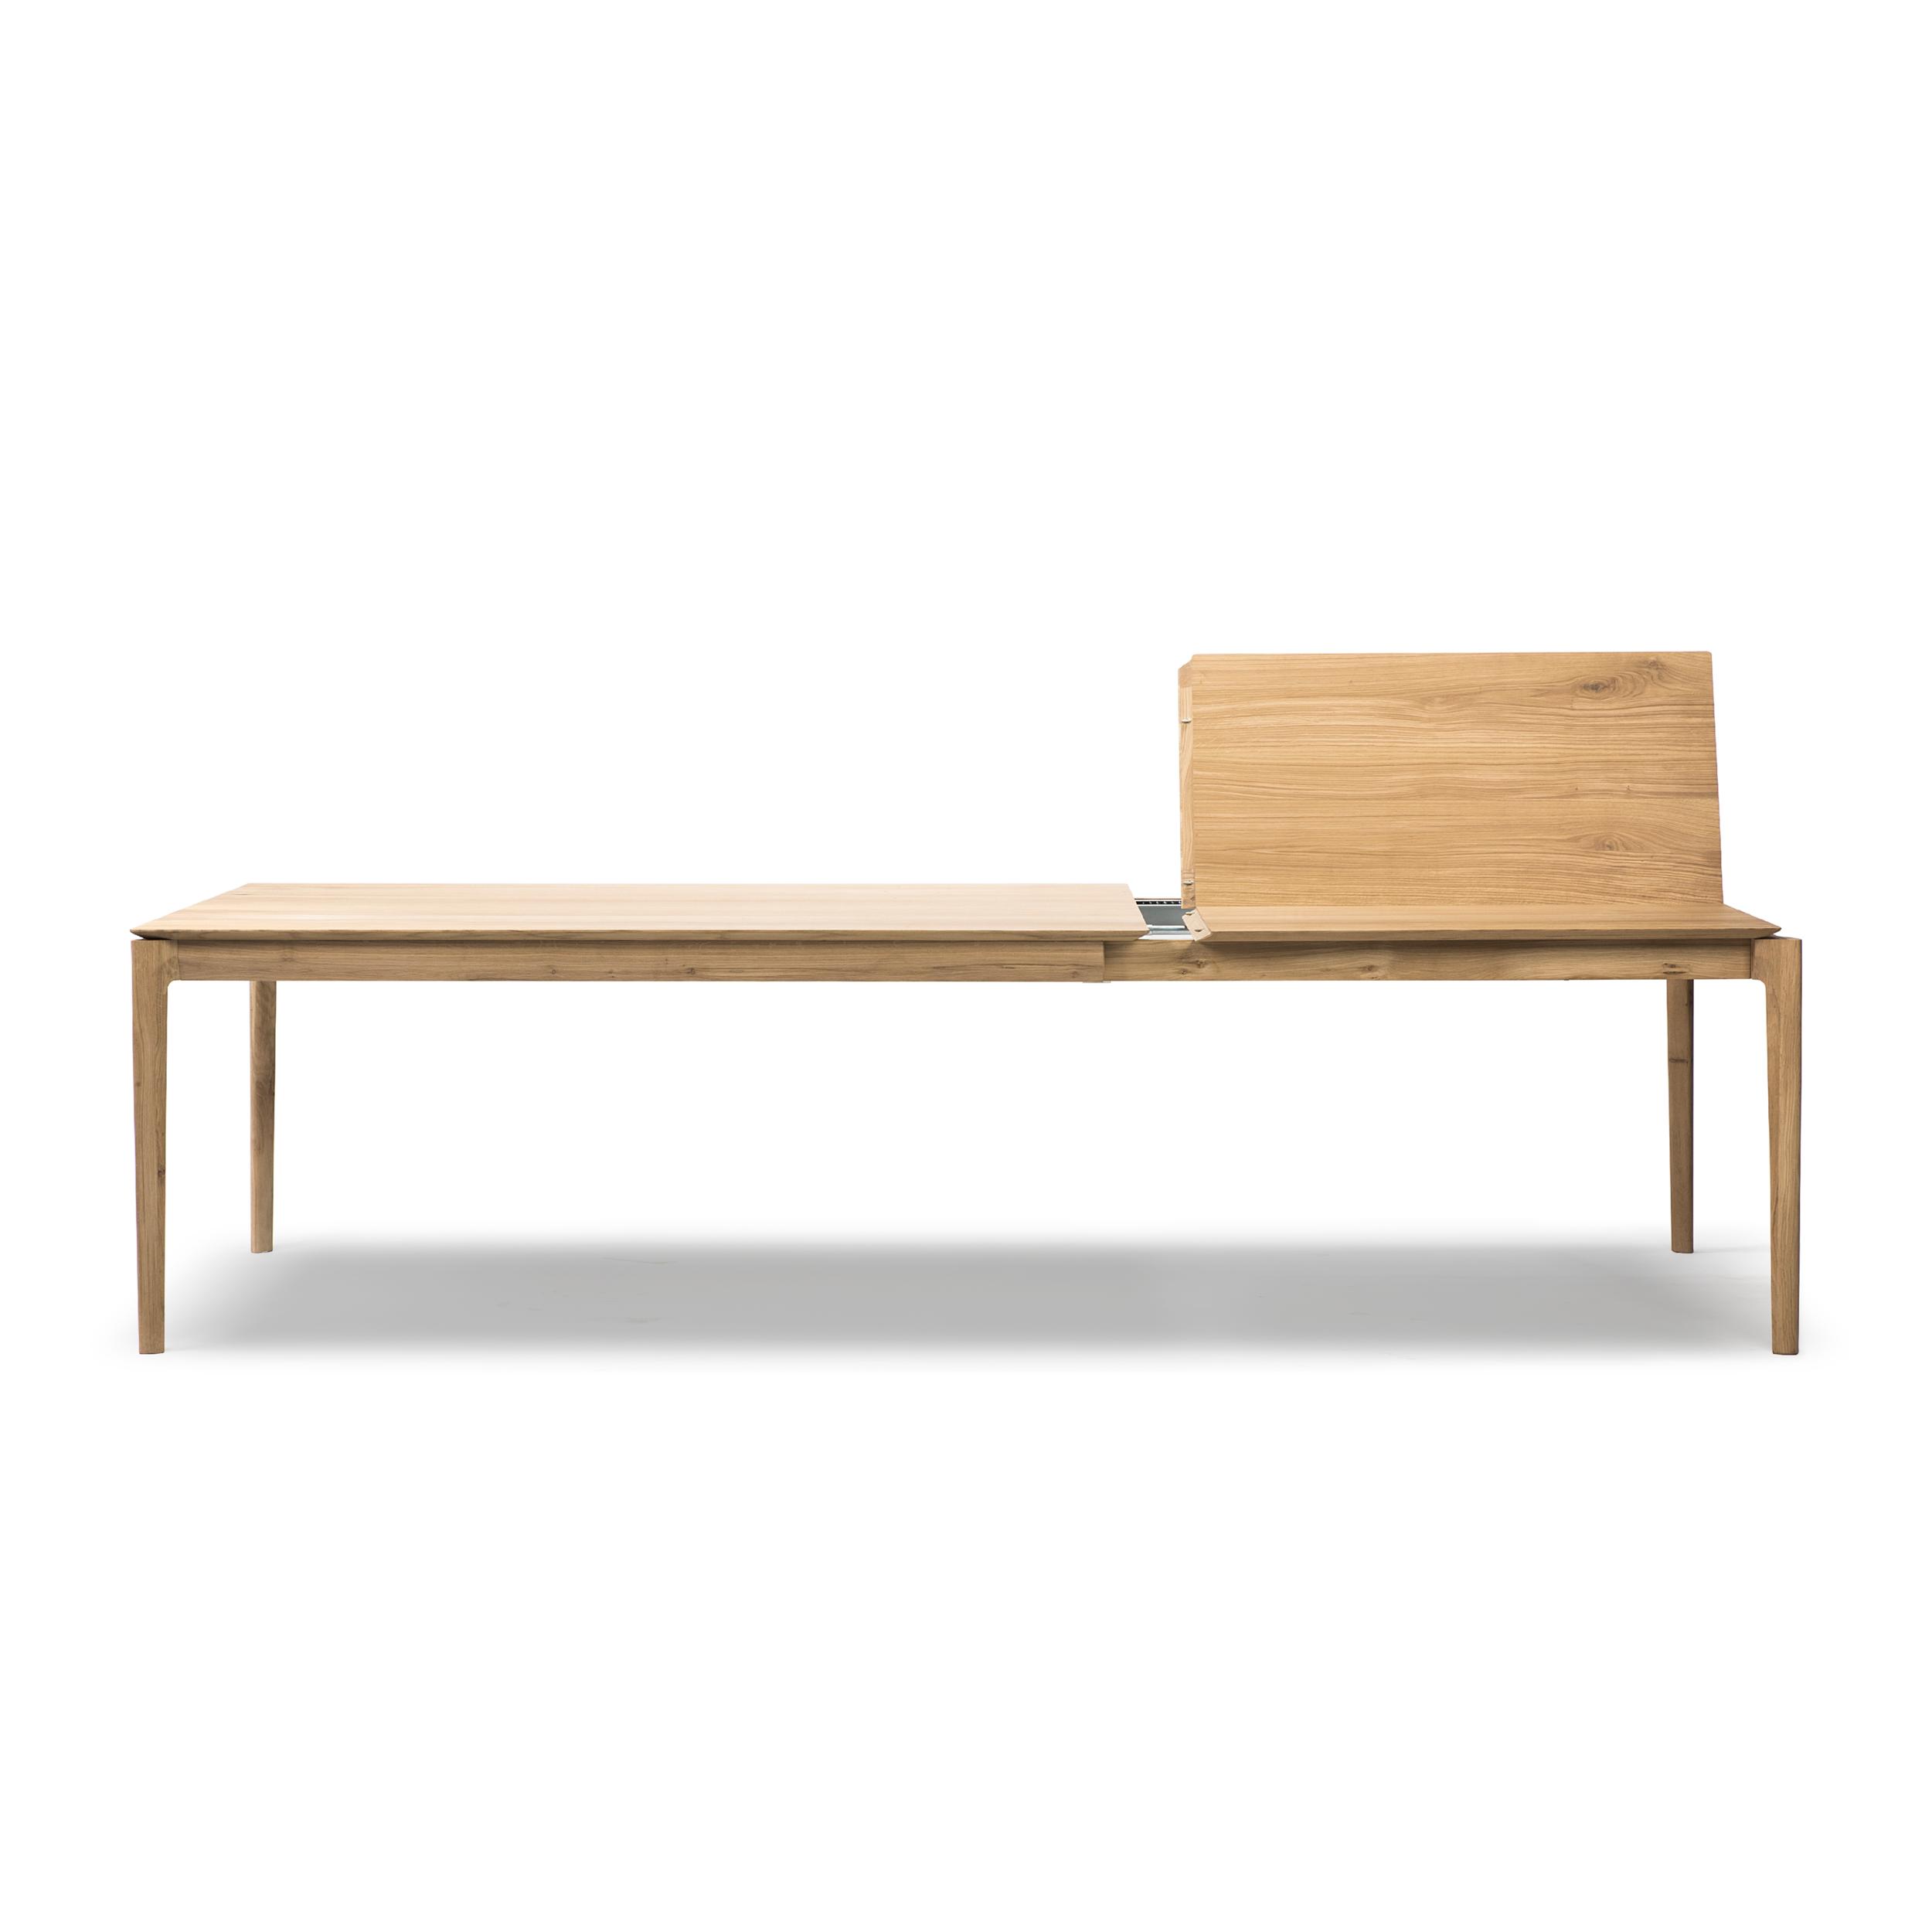 51502, 51503 & 51504 Oak Bok extendable dining table_extend3.jpg.png